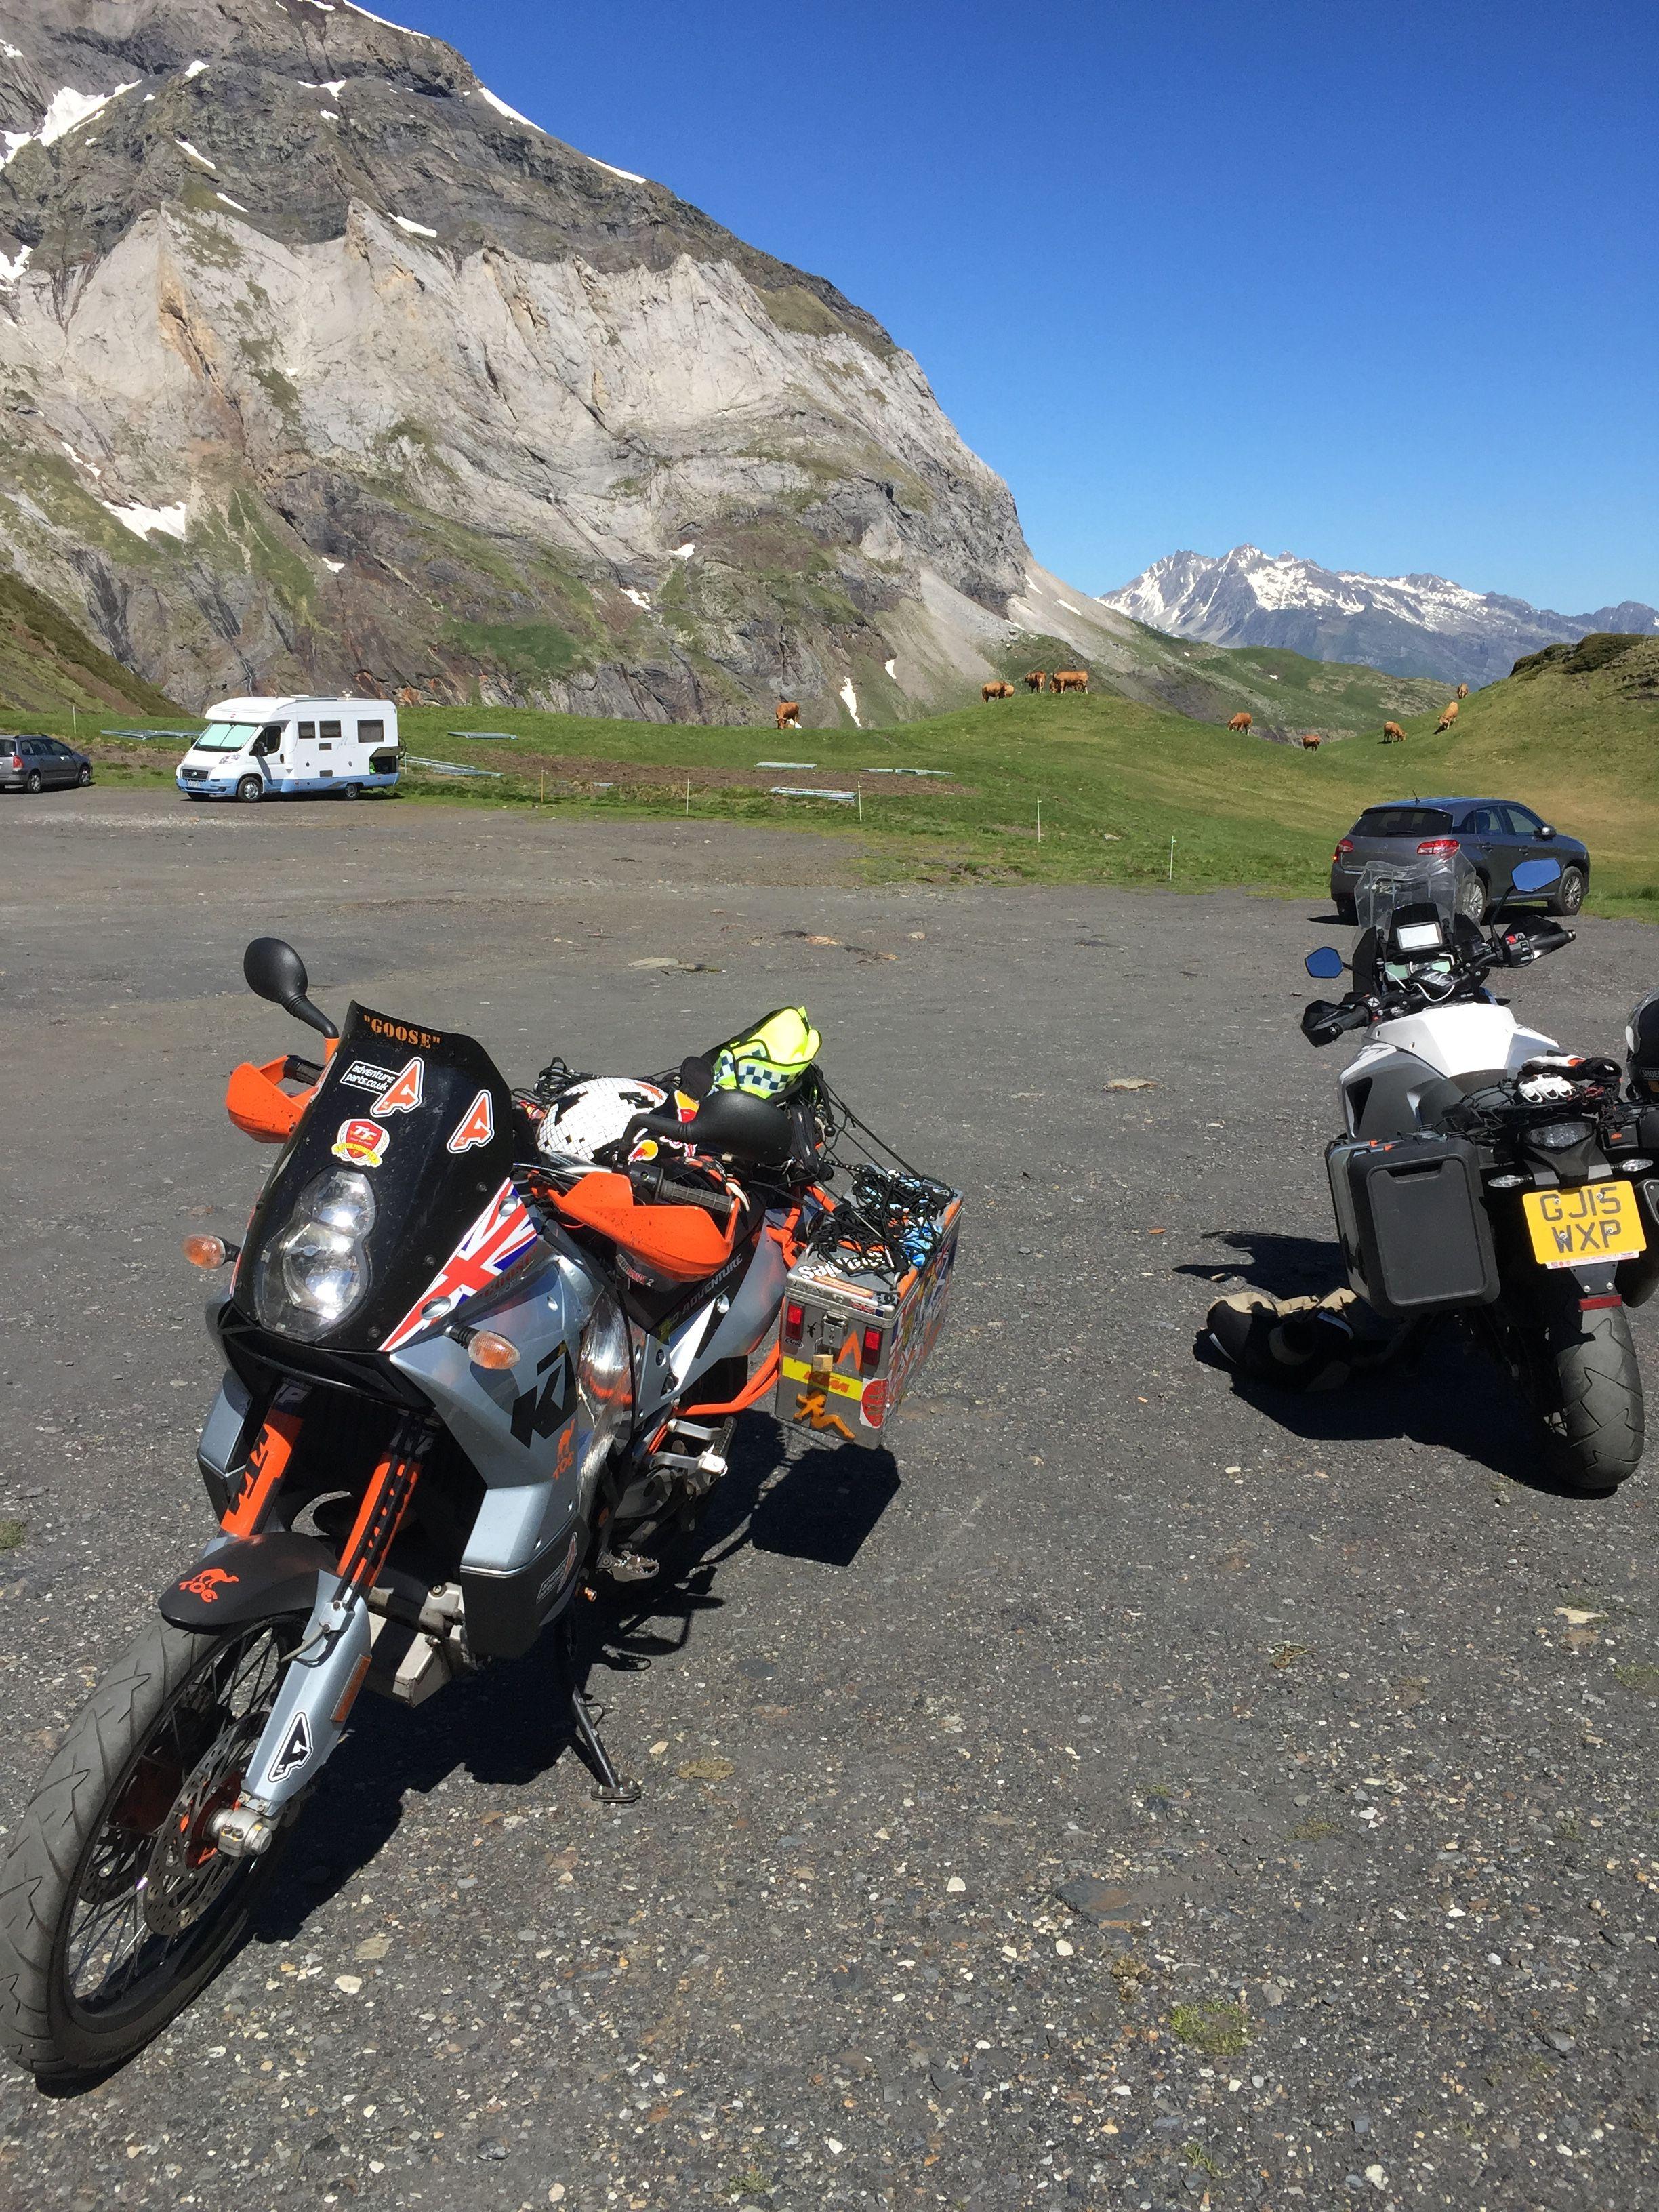 Pin by Paul Chapman on Adventure Motorcycling ADV ABR